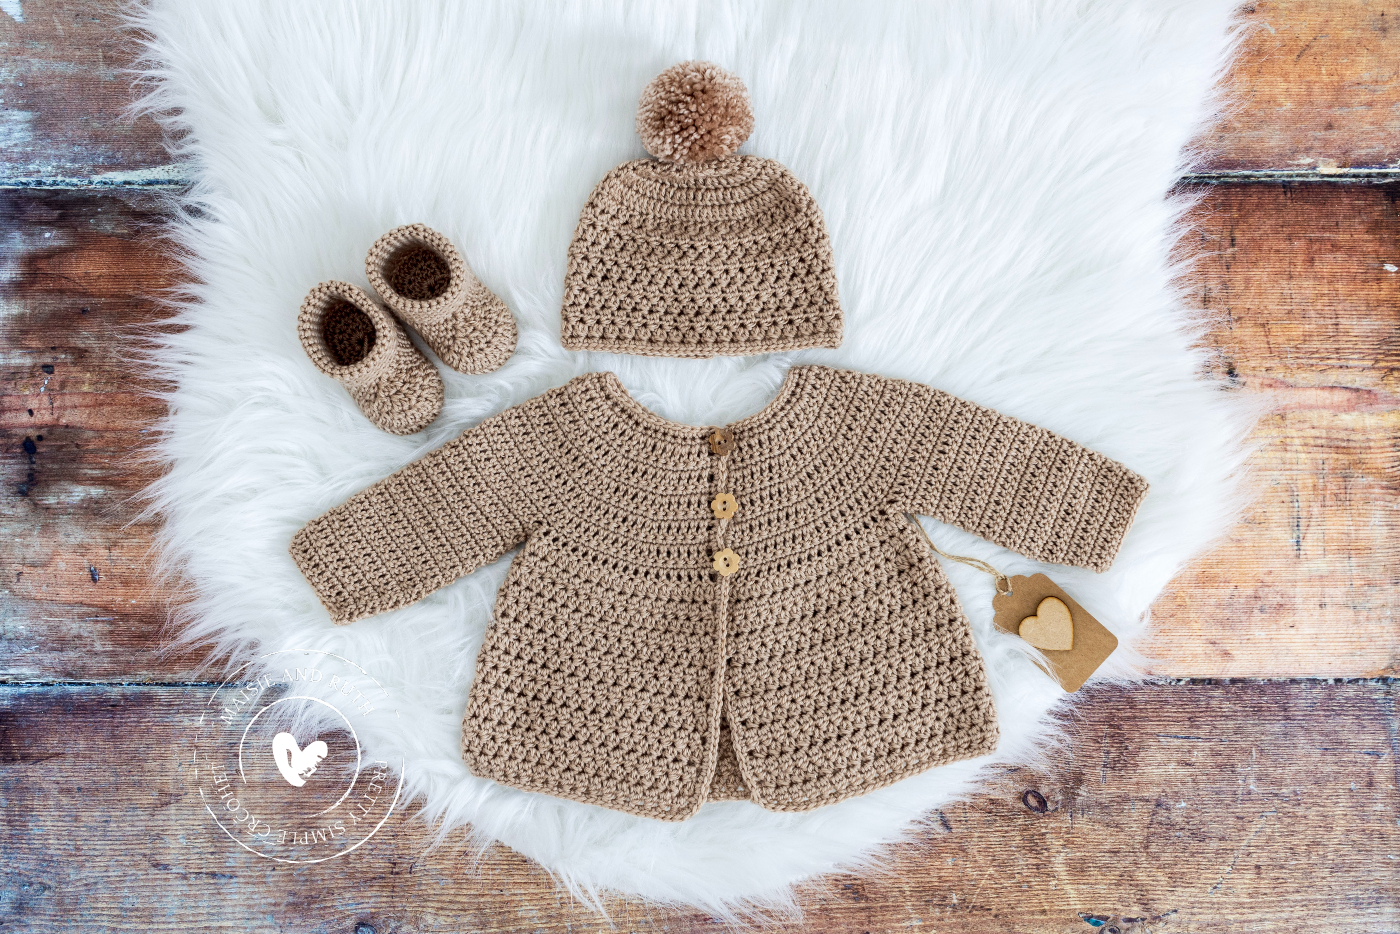 Crochet Baby Cardigan Pattern on white furry rug